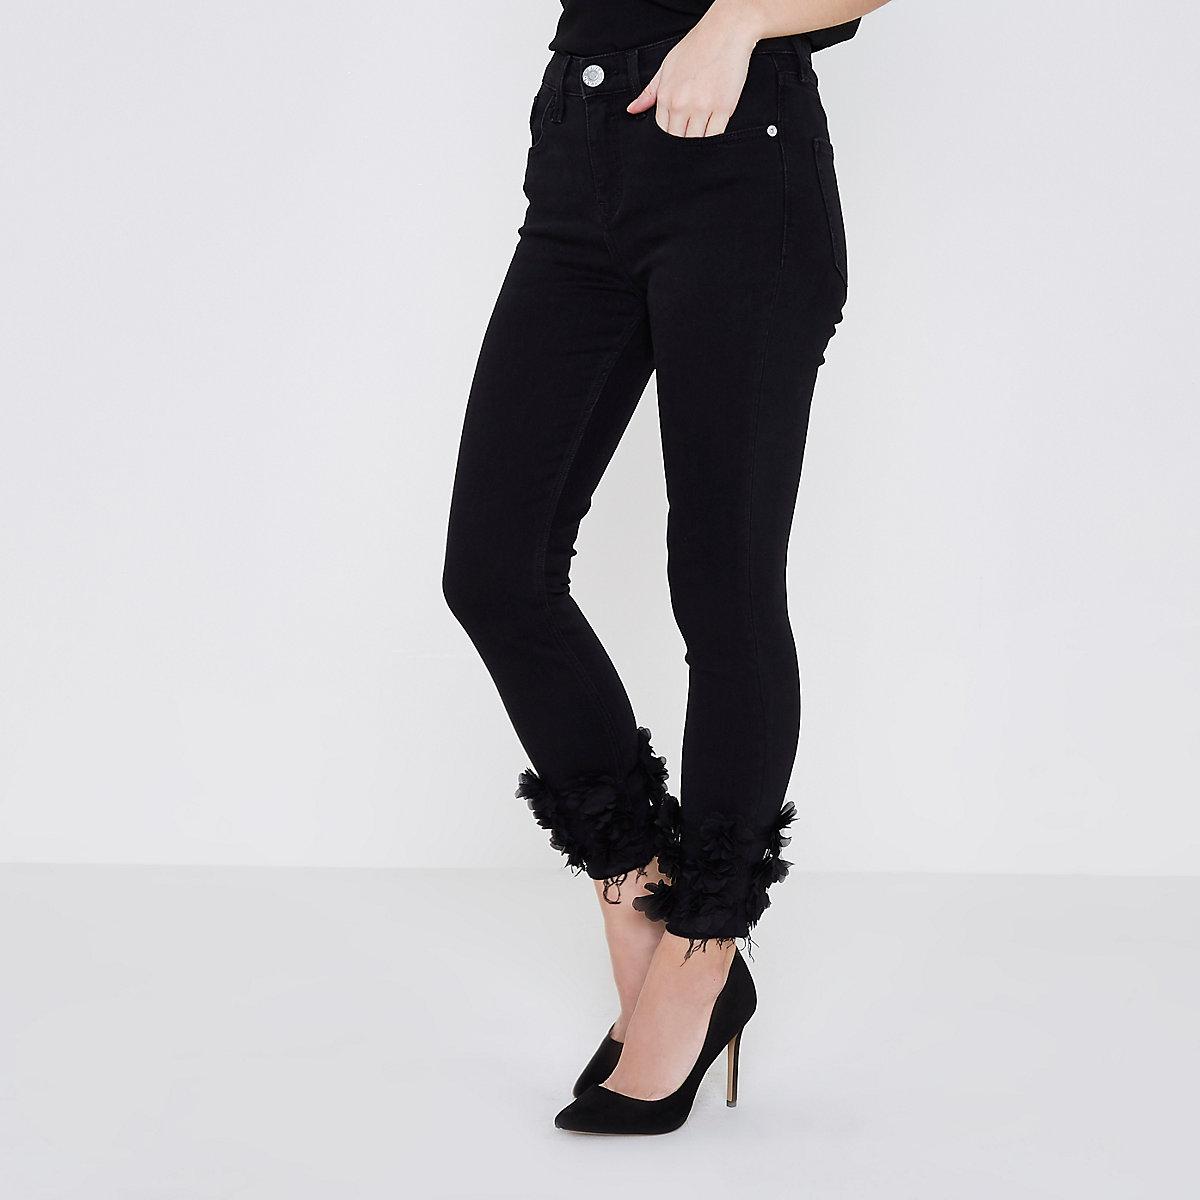 Petite black flower Amelie super skinny jeans